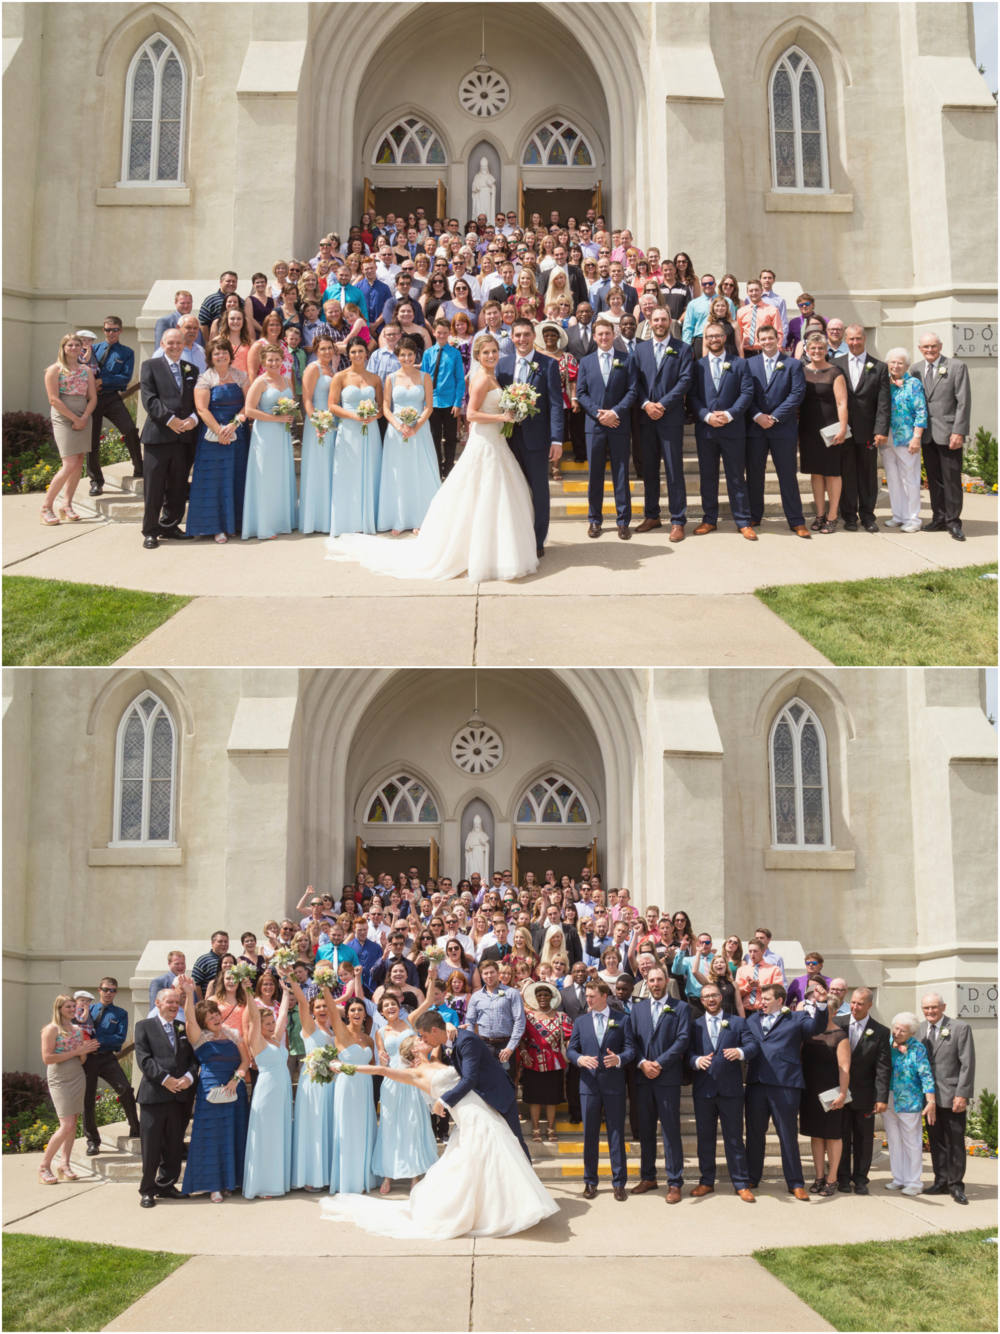 st_patricks_church_wedding_09.png